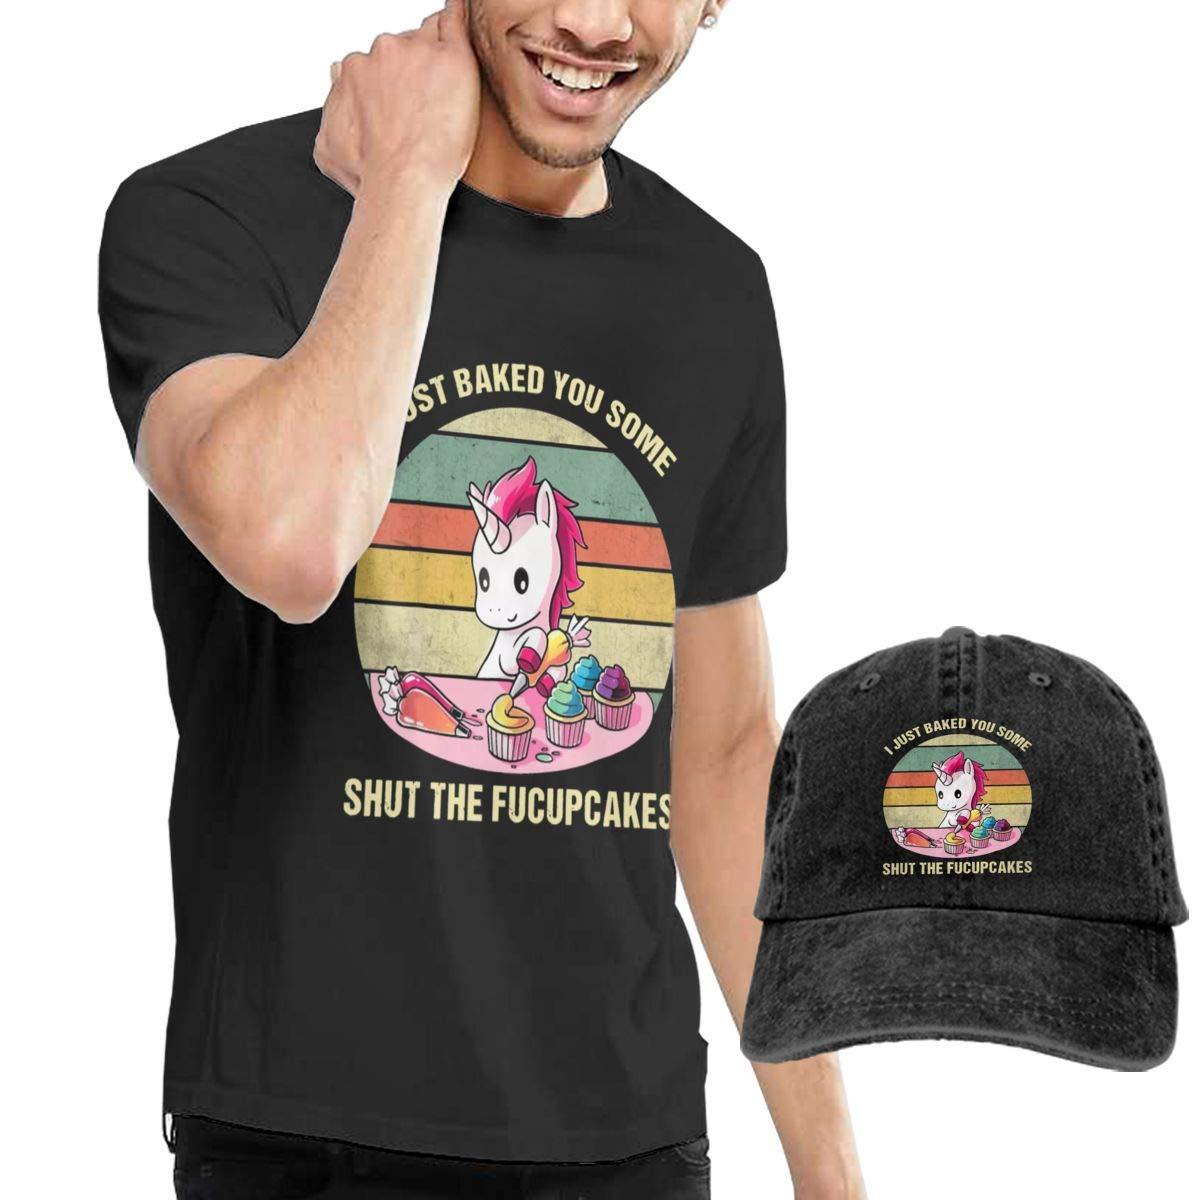 QQWBB I Just Baked You Some Shut The Fucupcakes T-Shirts Short Sleeve Denim Hat Men